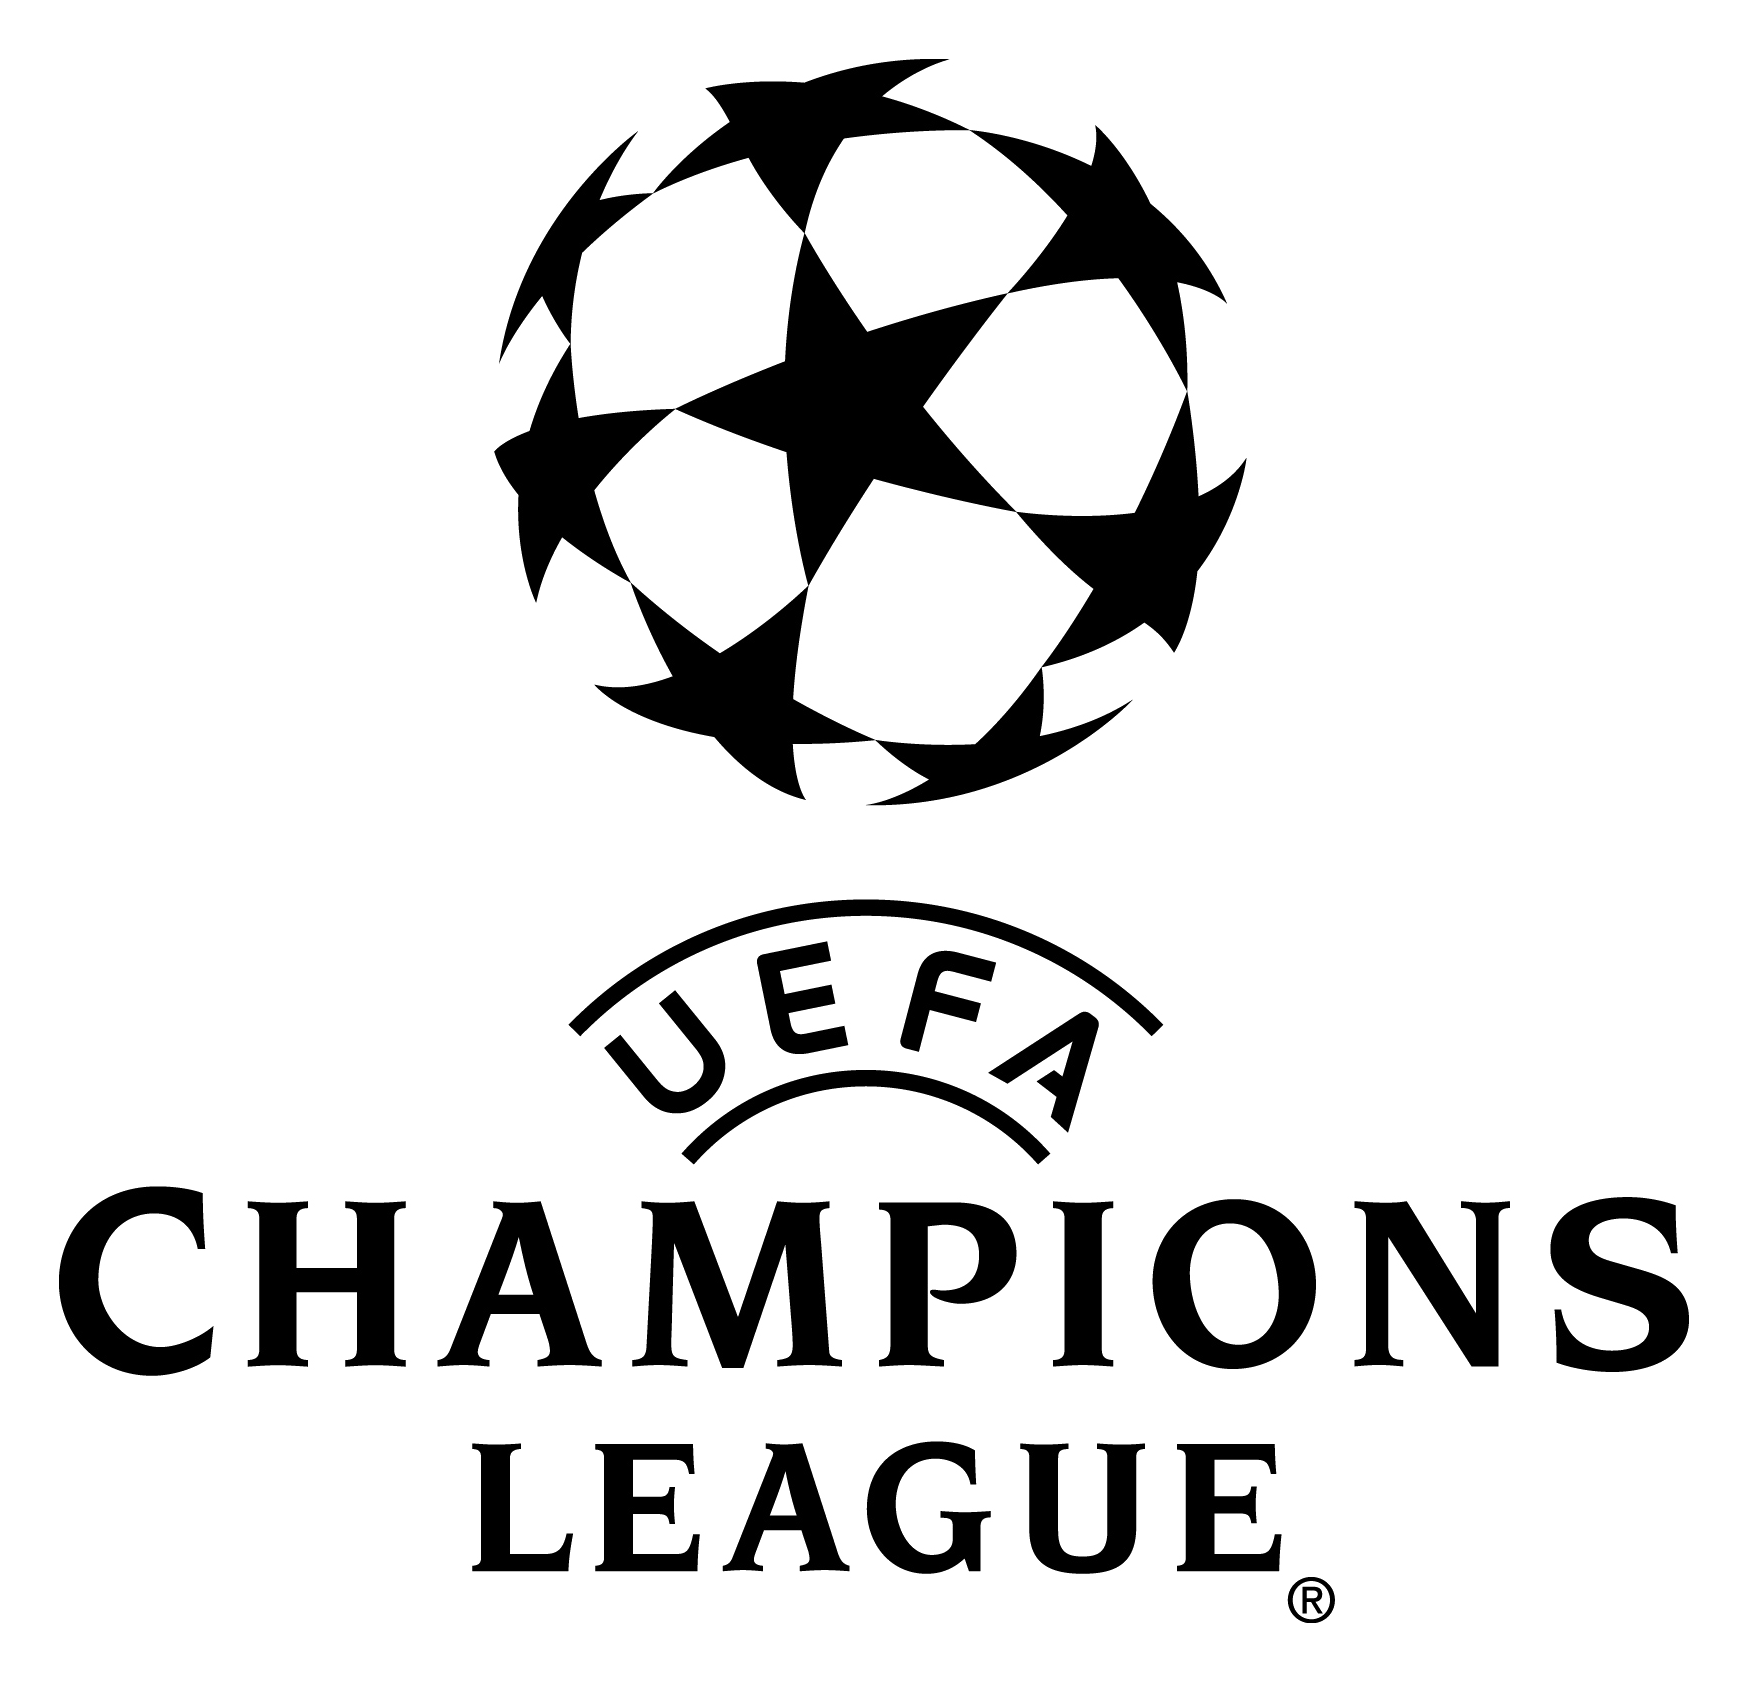 UEFA Champions League | Champions league logo, Champions league, Uefa  champions league